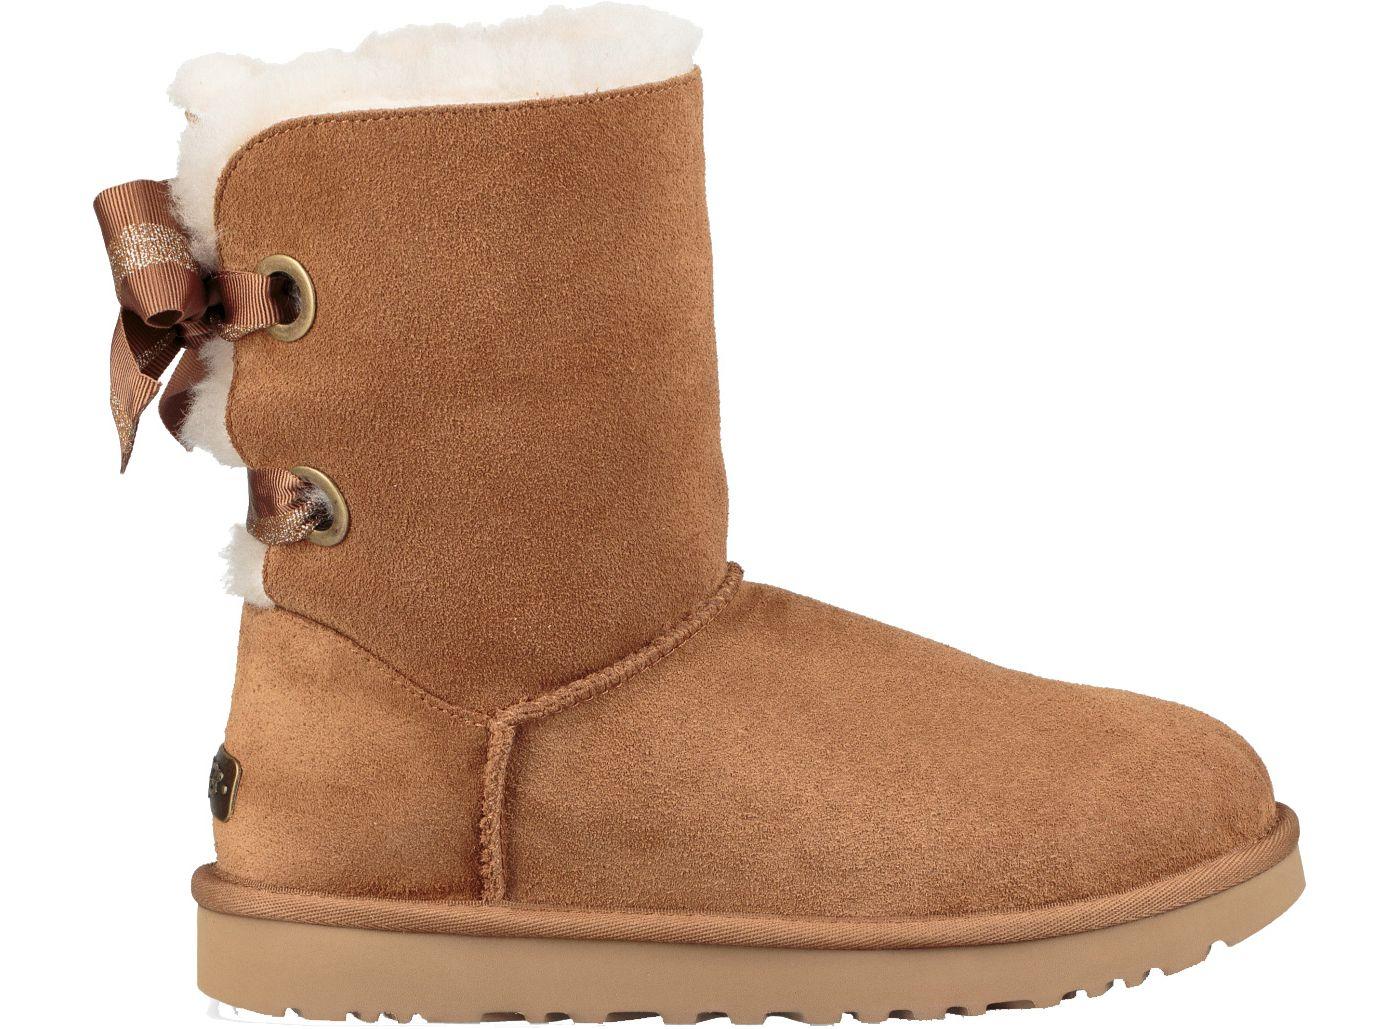 UGG Women's Customizable Bailey Bow Short Casual Boots